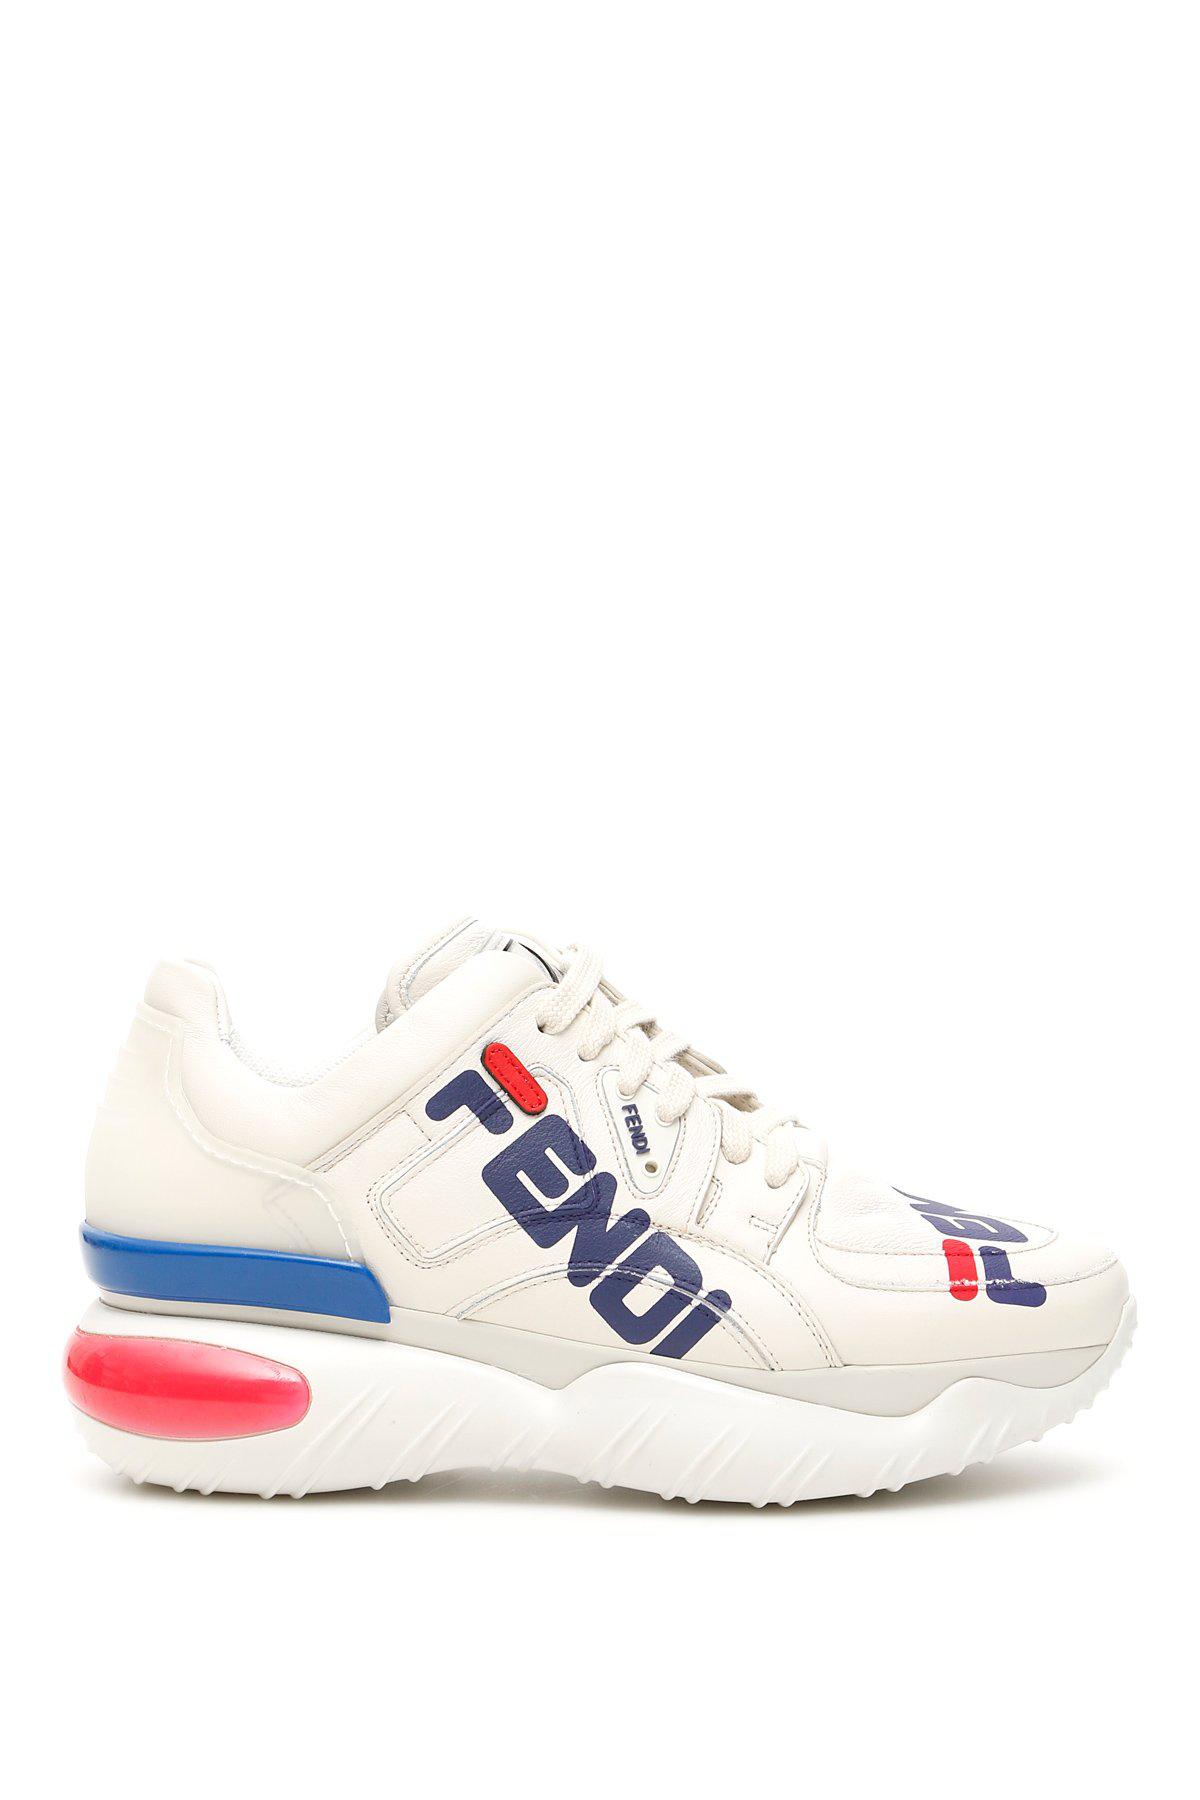 60b274142094 Fendi Mania Platform Sneakers In Bice+Caipir+Blueber. CETTIRE